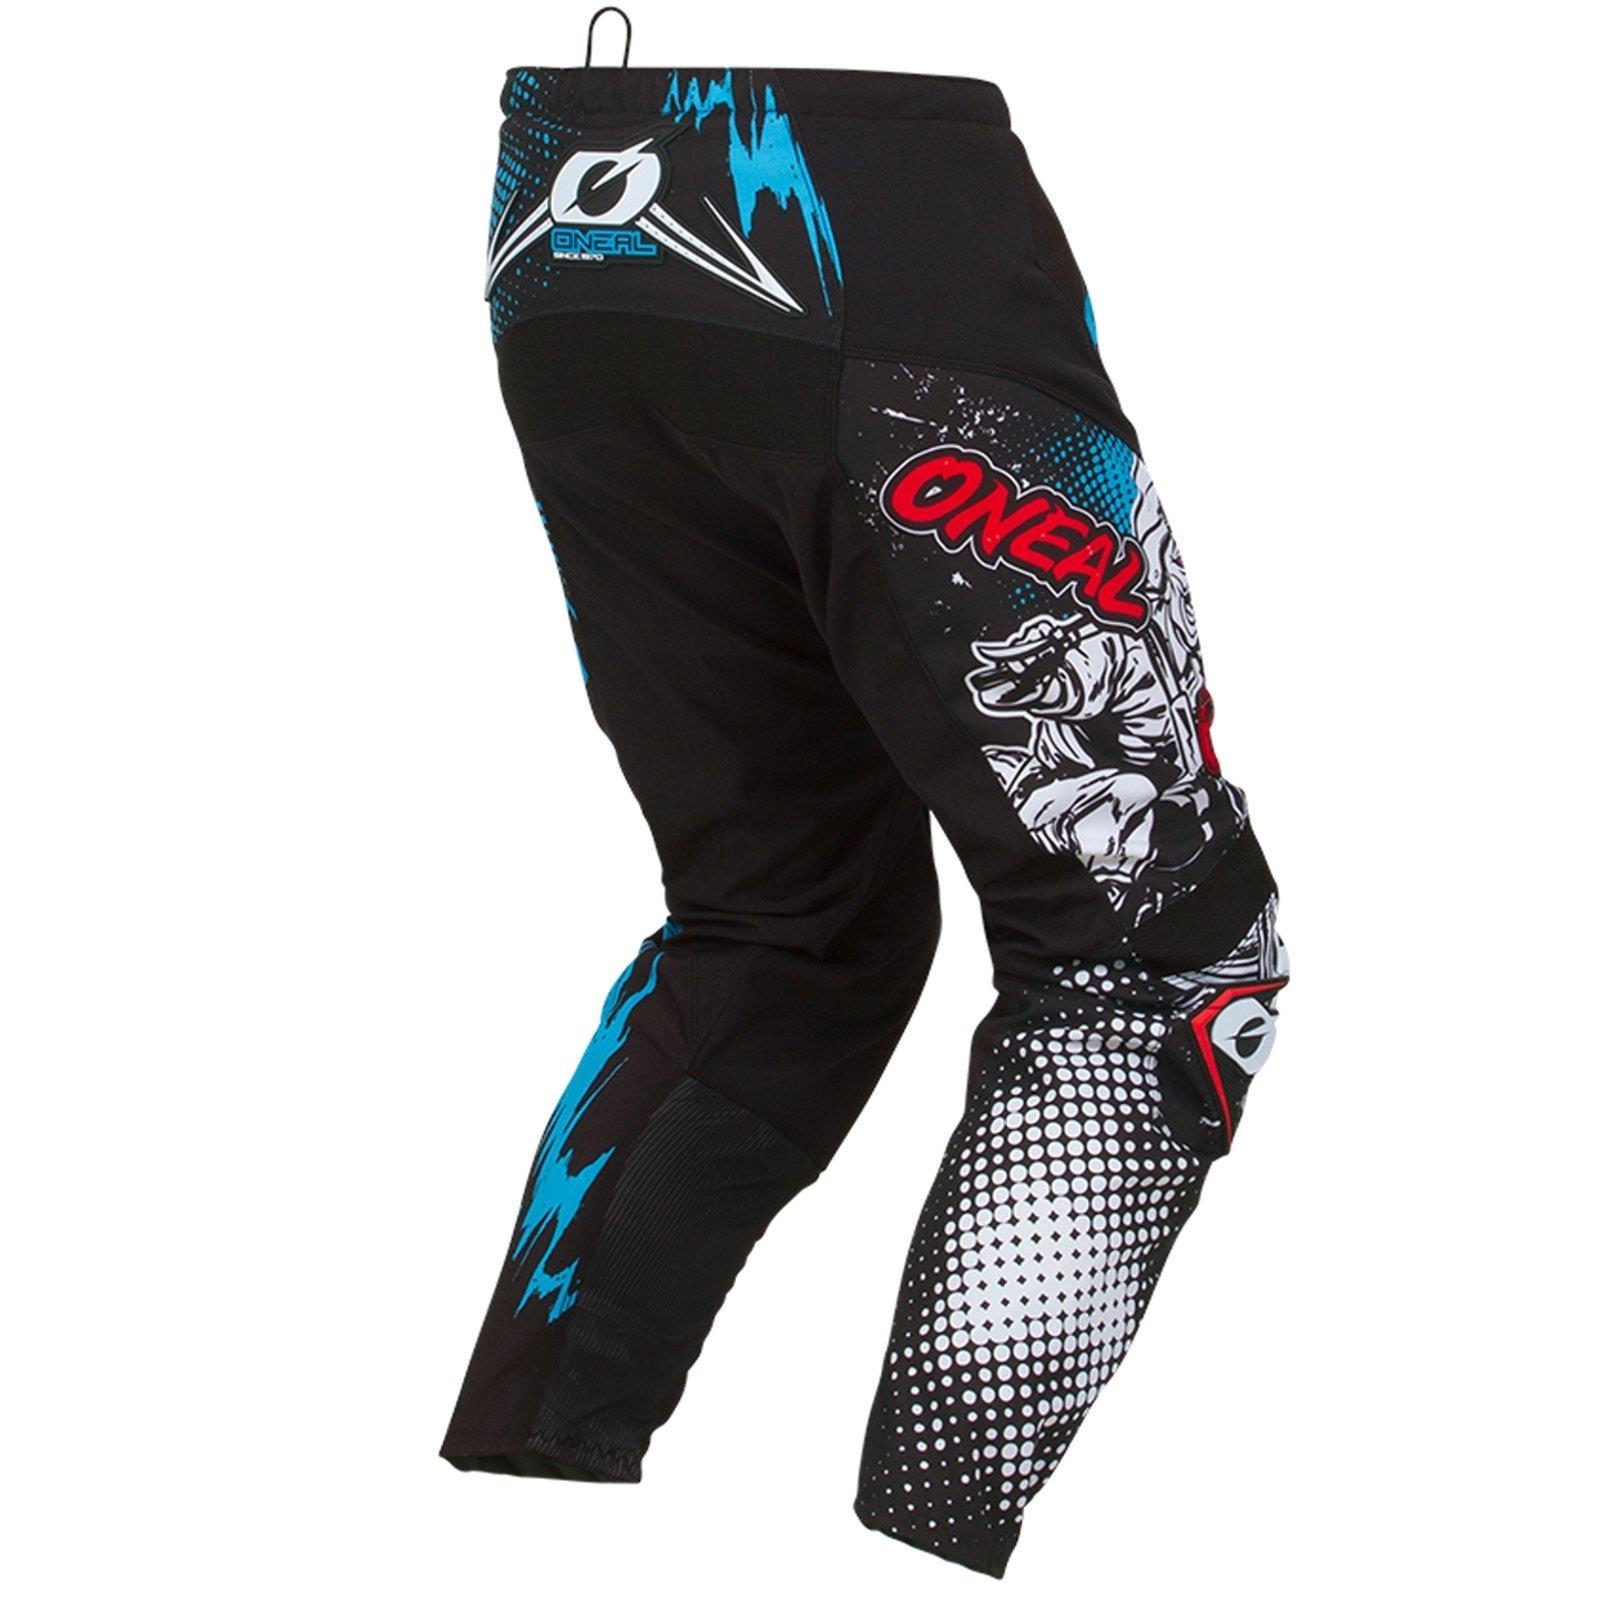 Oneal-elemento-Mayhem-Hardwear-Pants-pantalones-MX-DH-FR-Moto-Cross-Enduro-MTB-moto miniatura 35